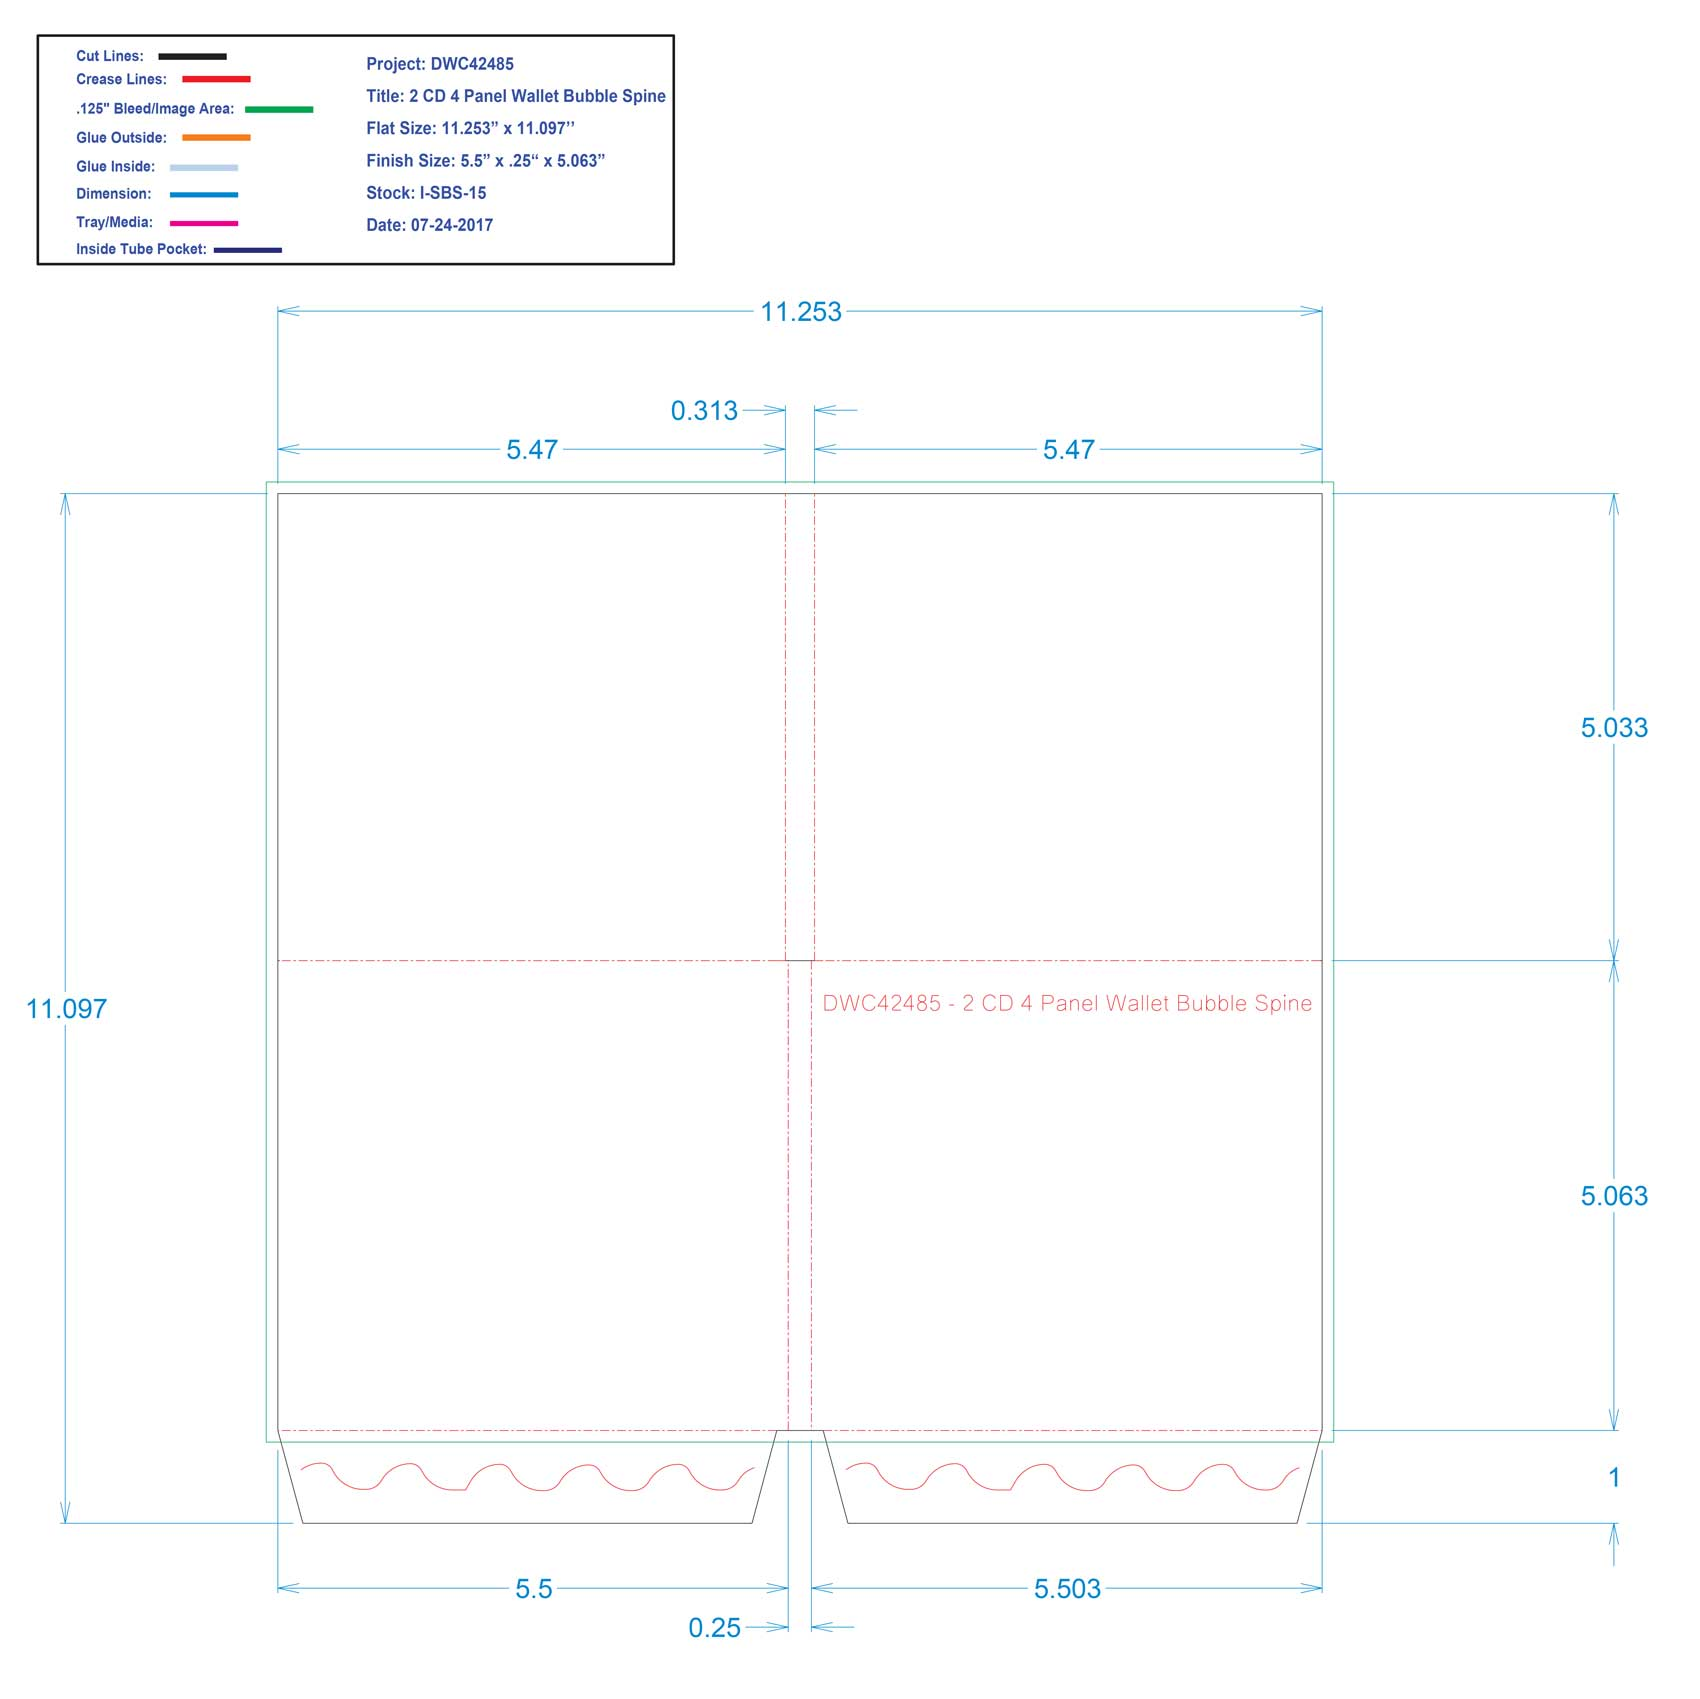 DWC42485_2-CD 4_Panel Wallet Bubble Spine